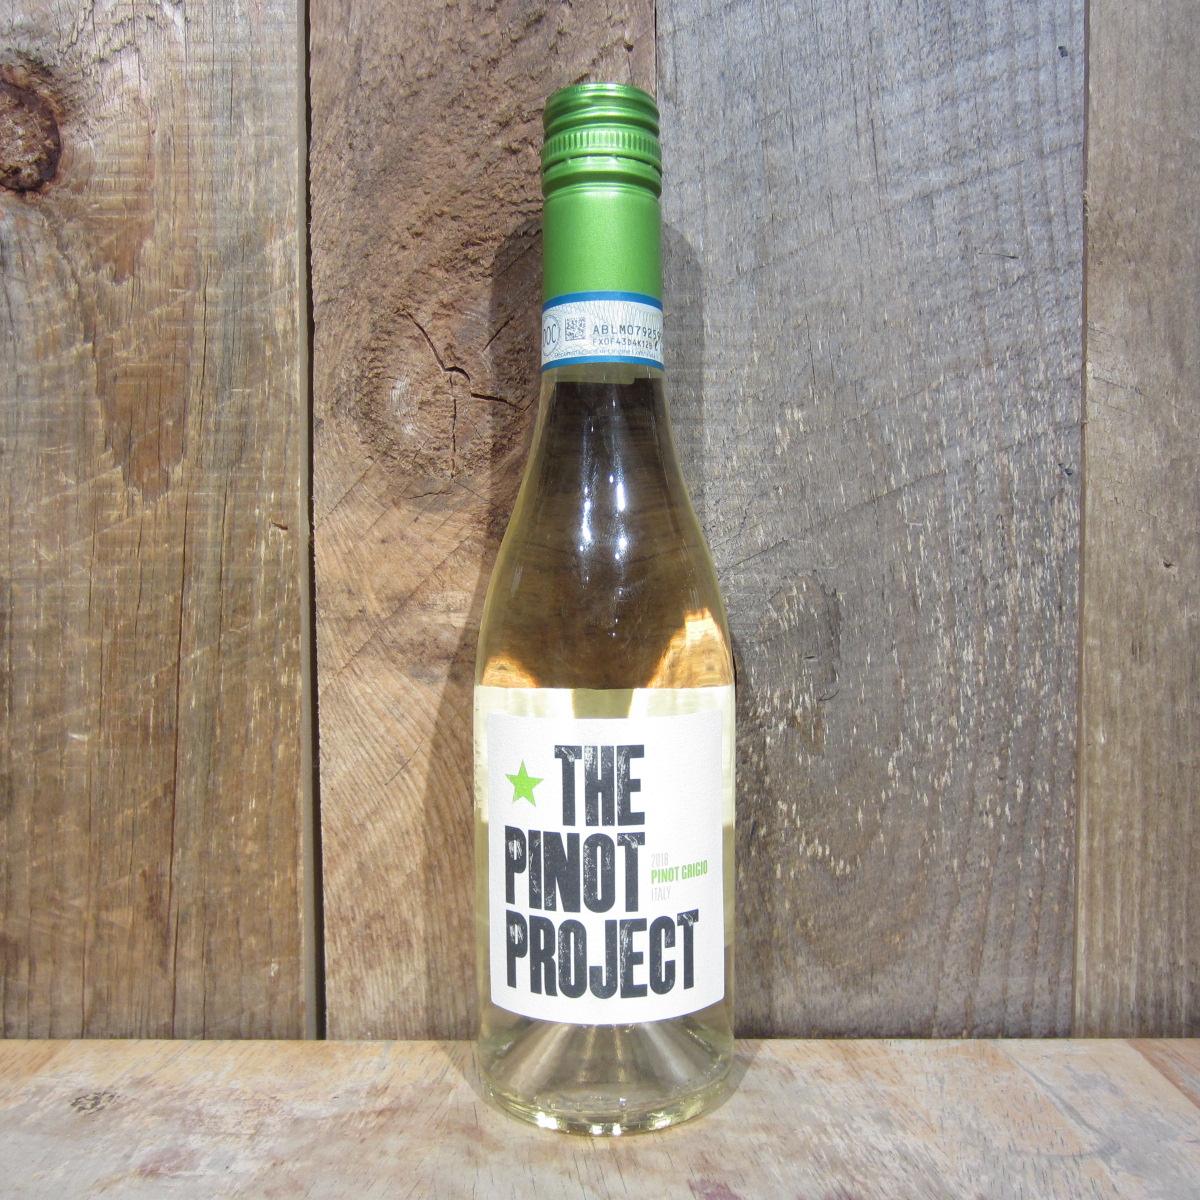 Pinot Project Pinot Grigio 375ml (Half Size Btl)